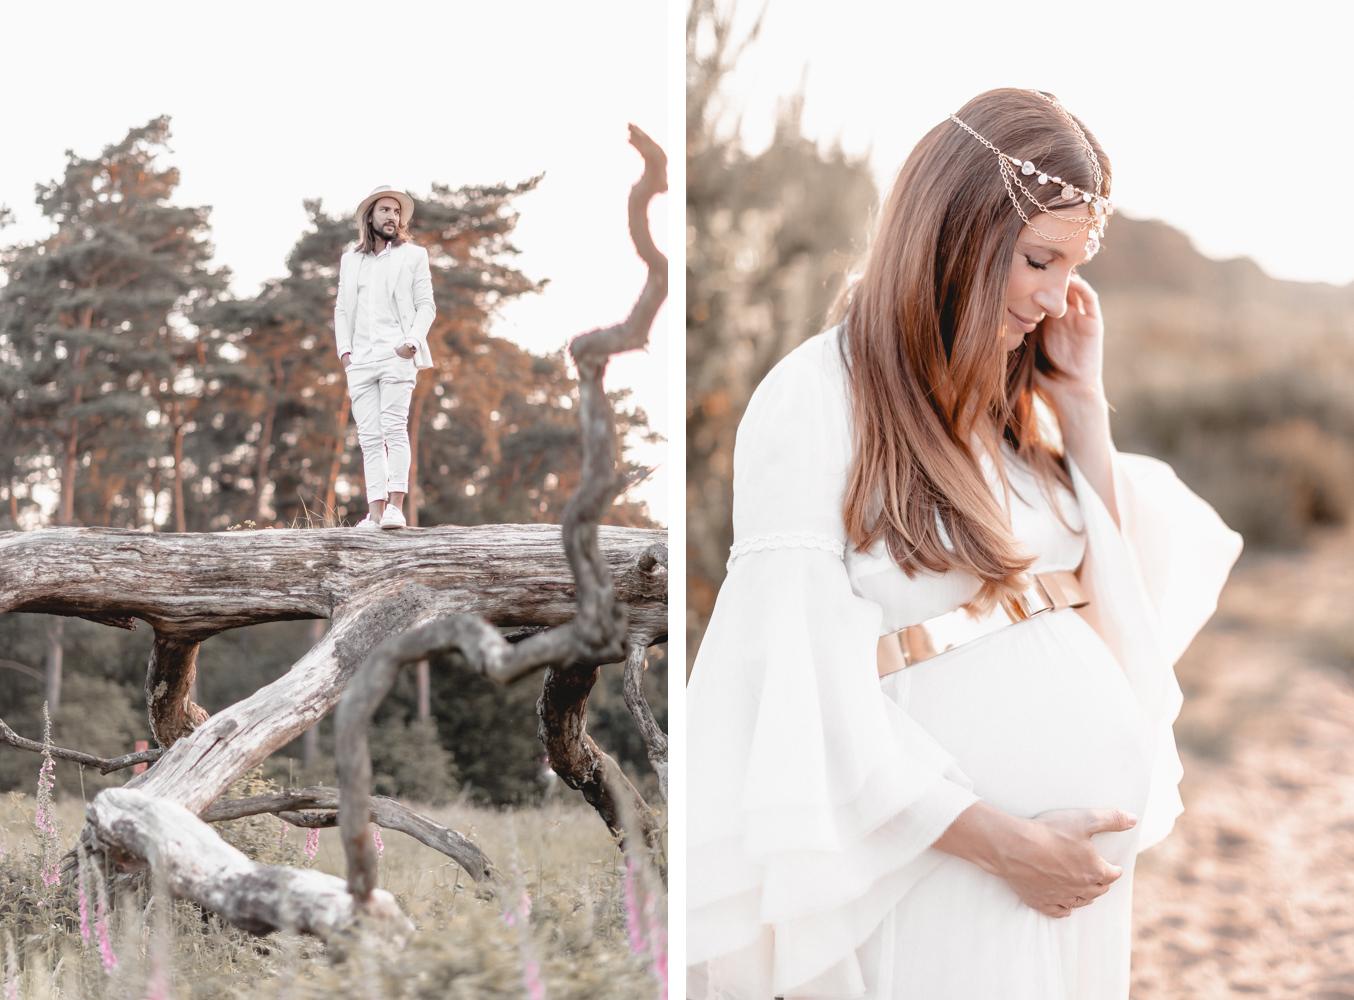 Schwangerschaftsshooting mit Lena Terlutter in der Wahner Heide Köln Fotograf